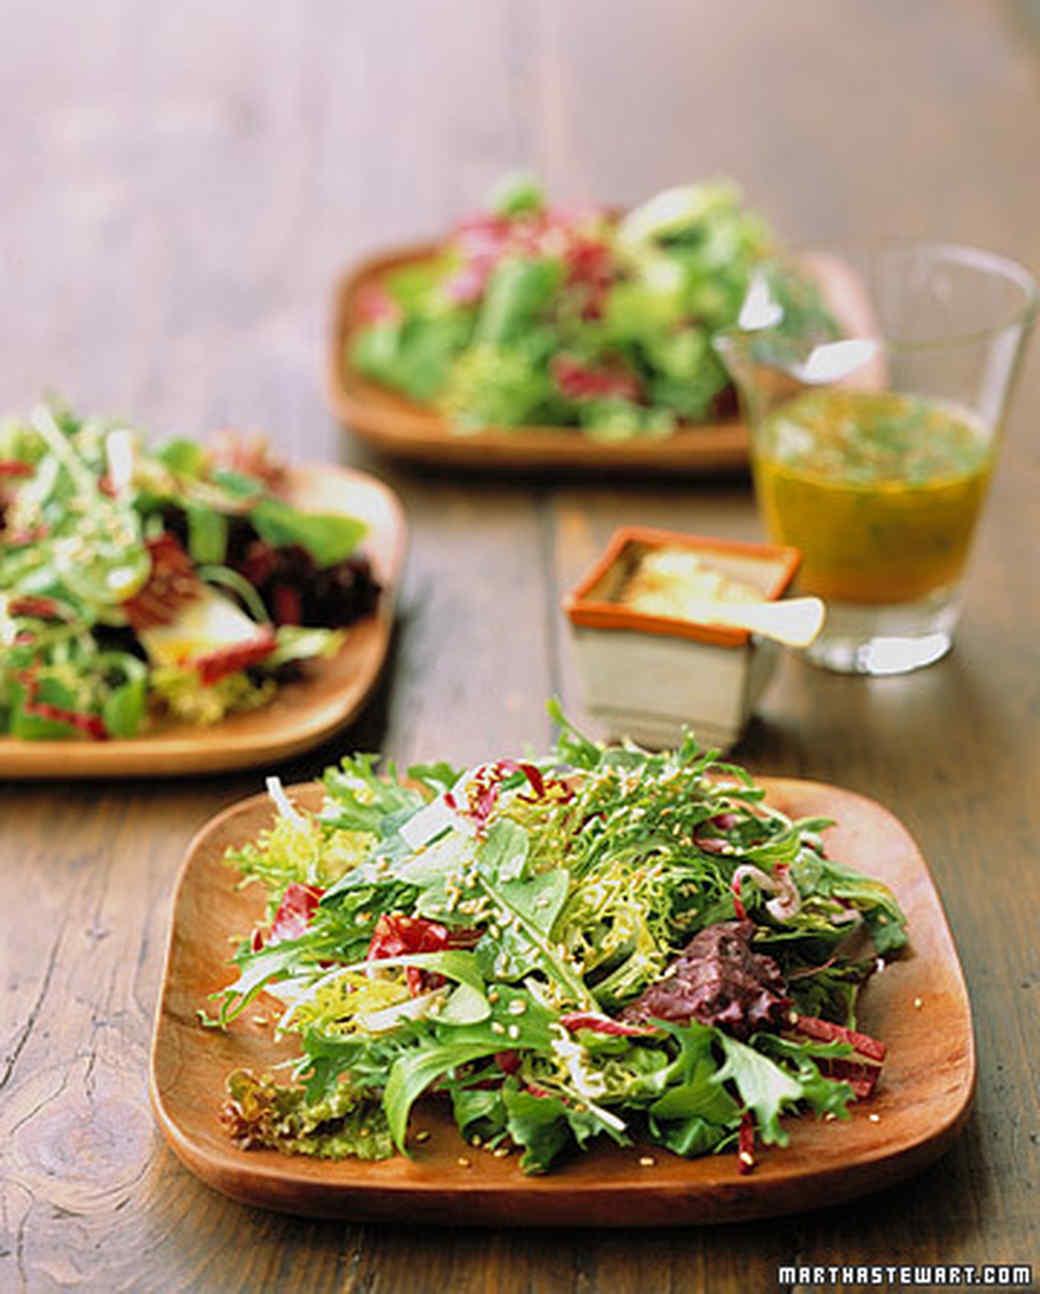 Greens with Orange Vinaigrette and Toasted Sesame Seeds